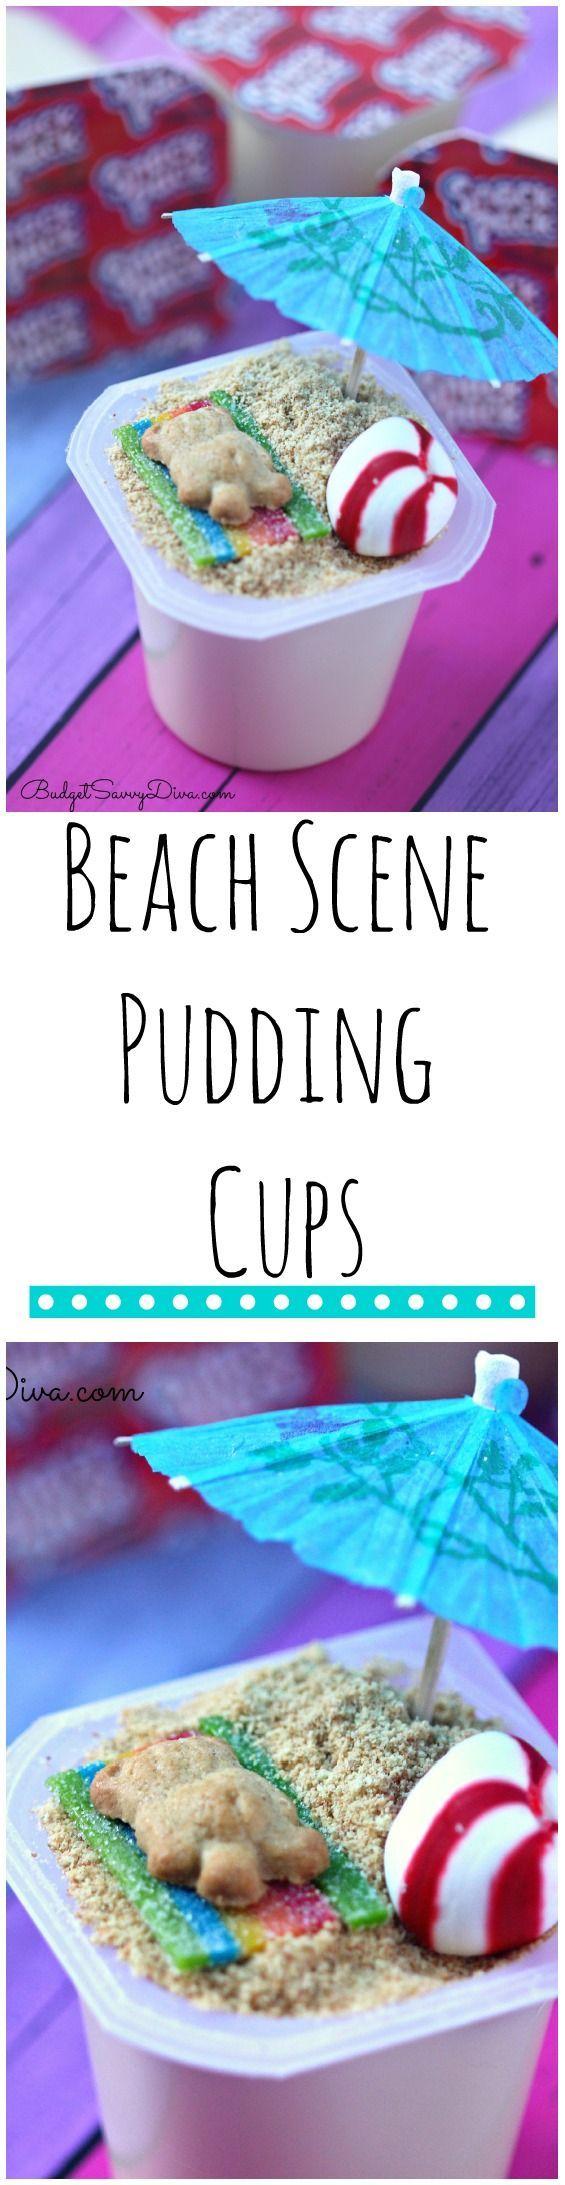 Beach Scene Pudding Cups Recipe | Pudding Snacks @fatheaddecals